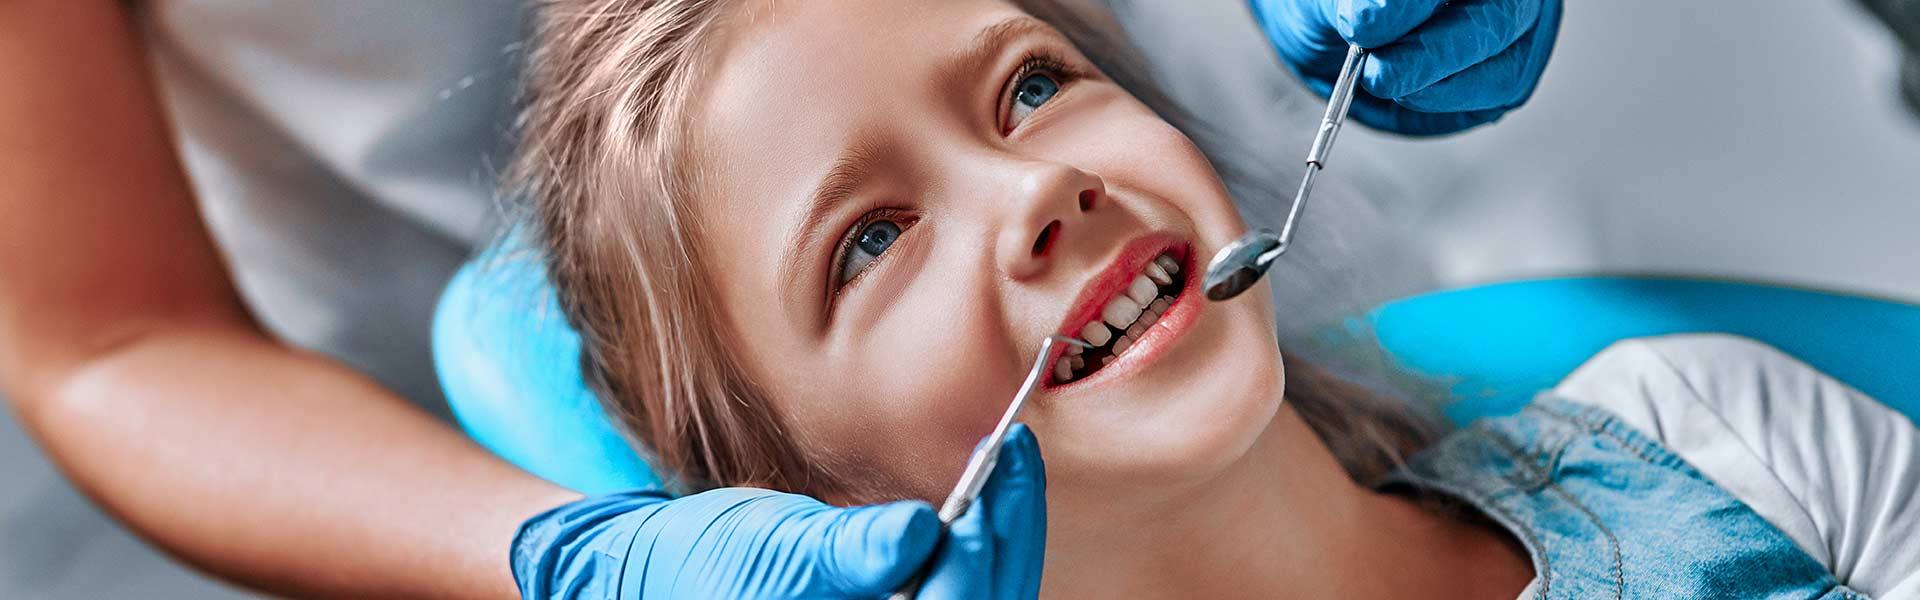 Child smiling during dental check up